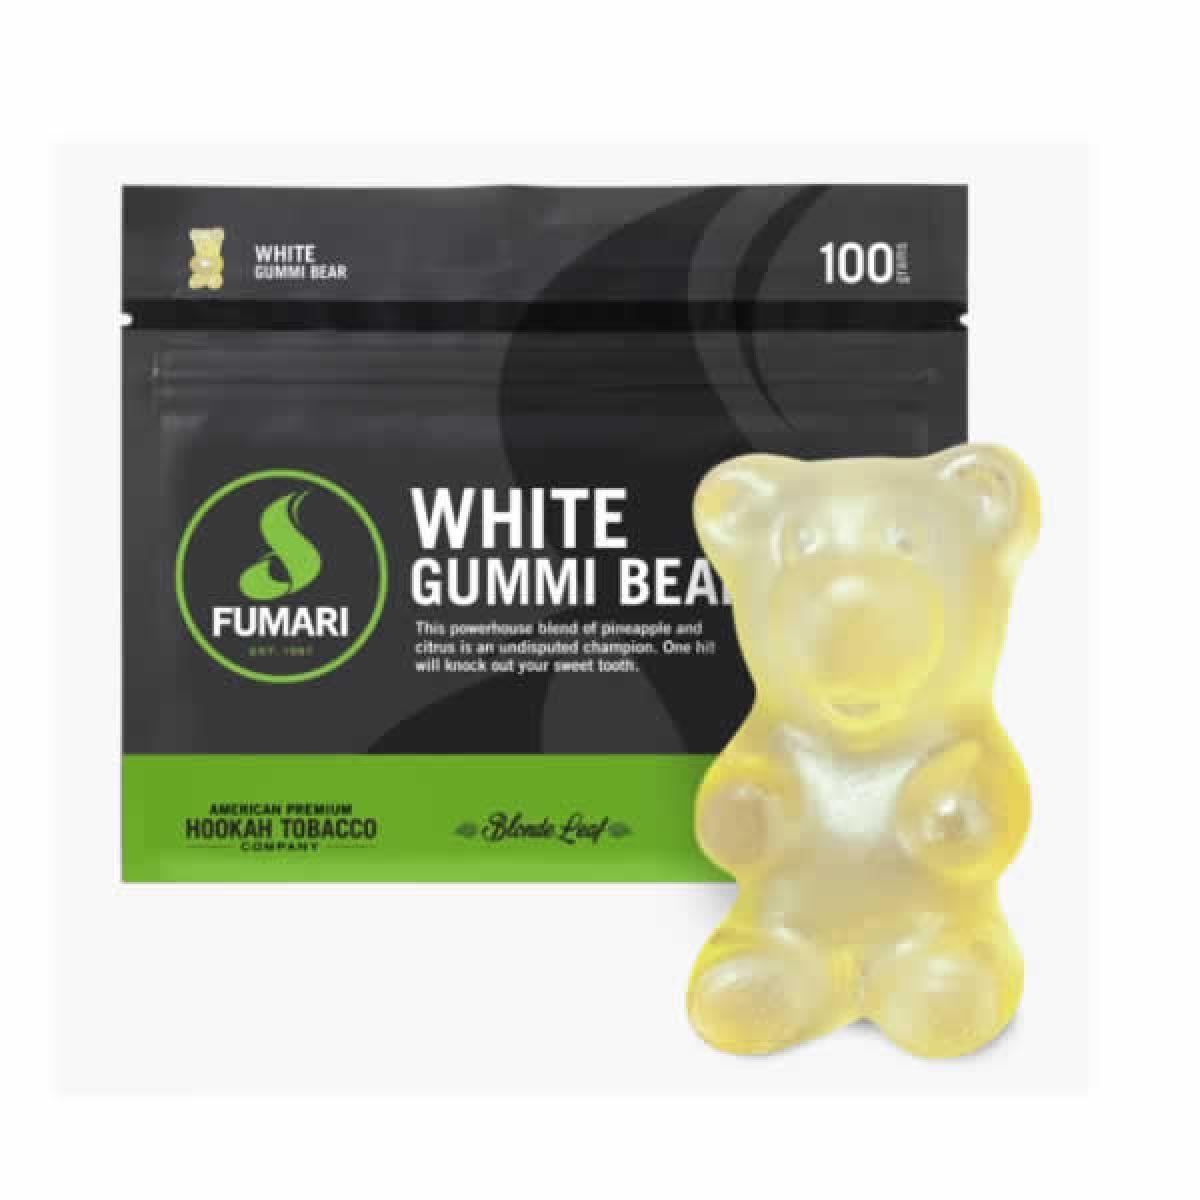 FUMARI WHITE GUMMI BEAR 100G/UND